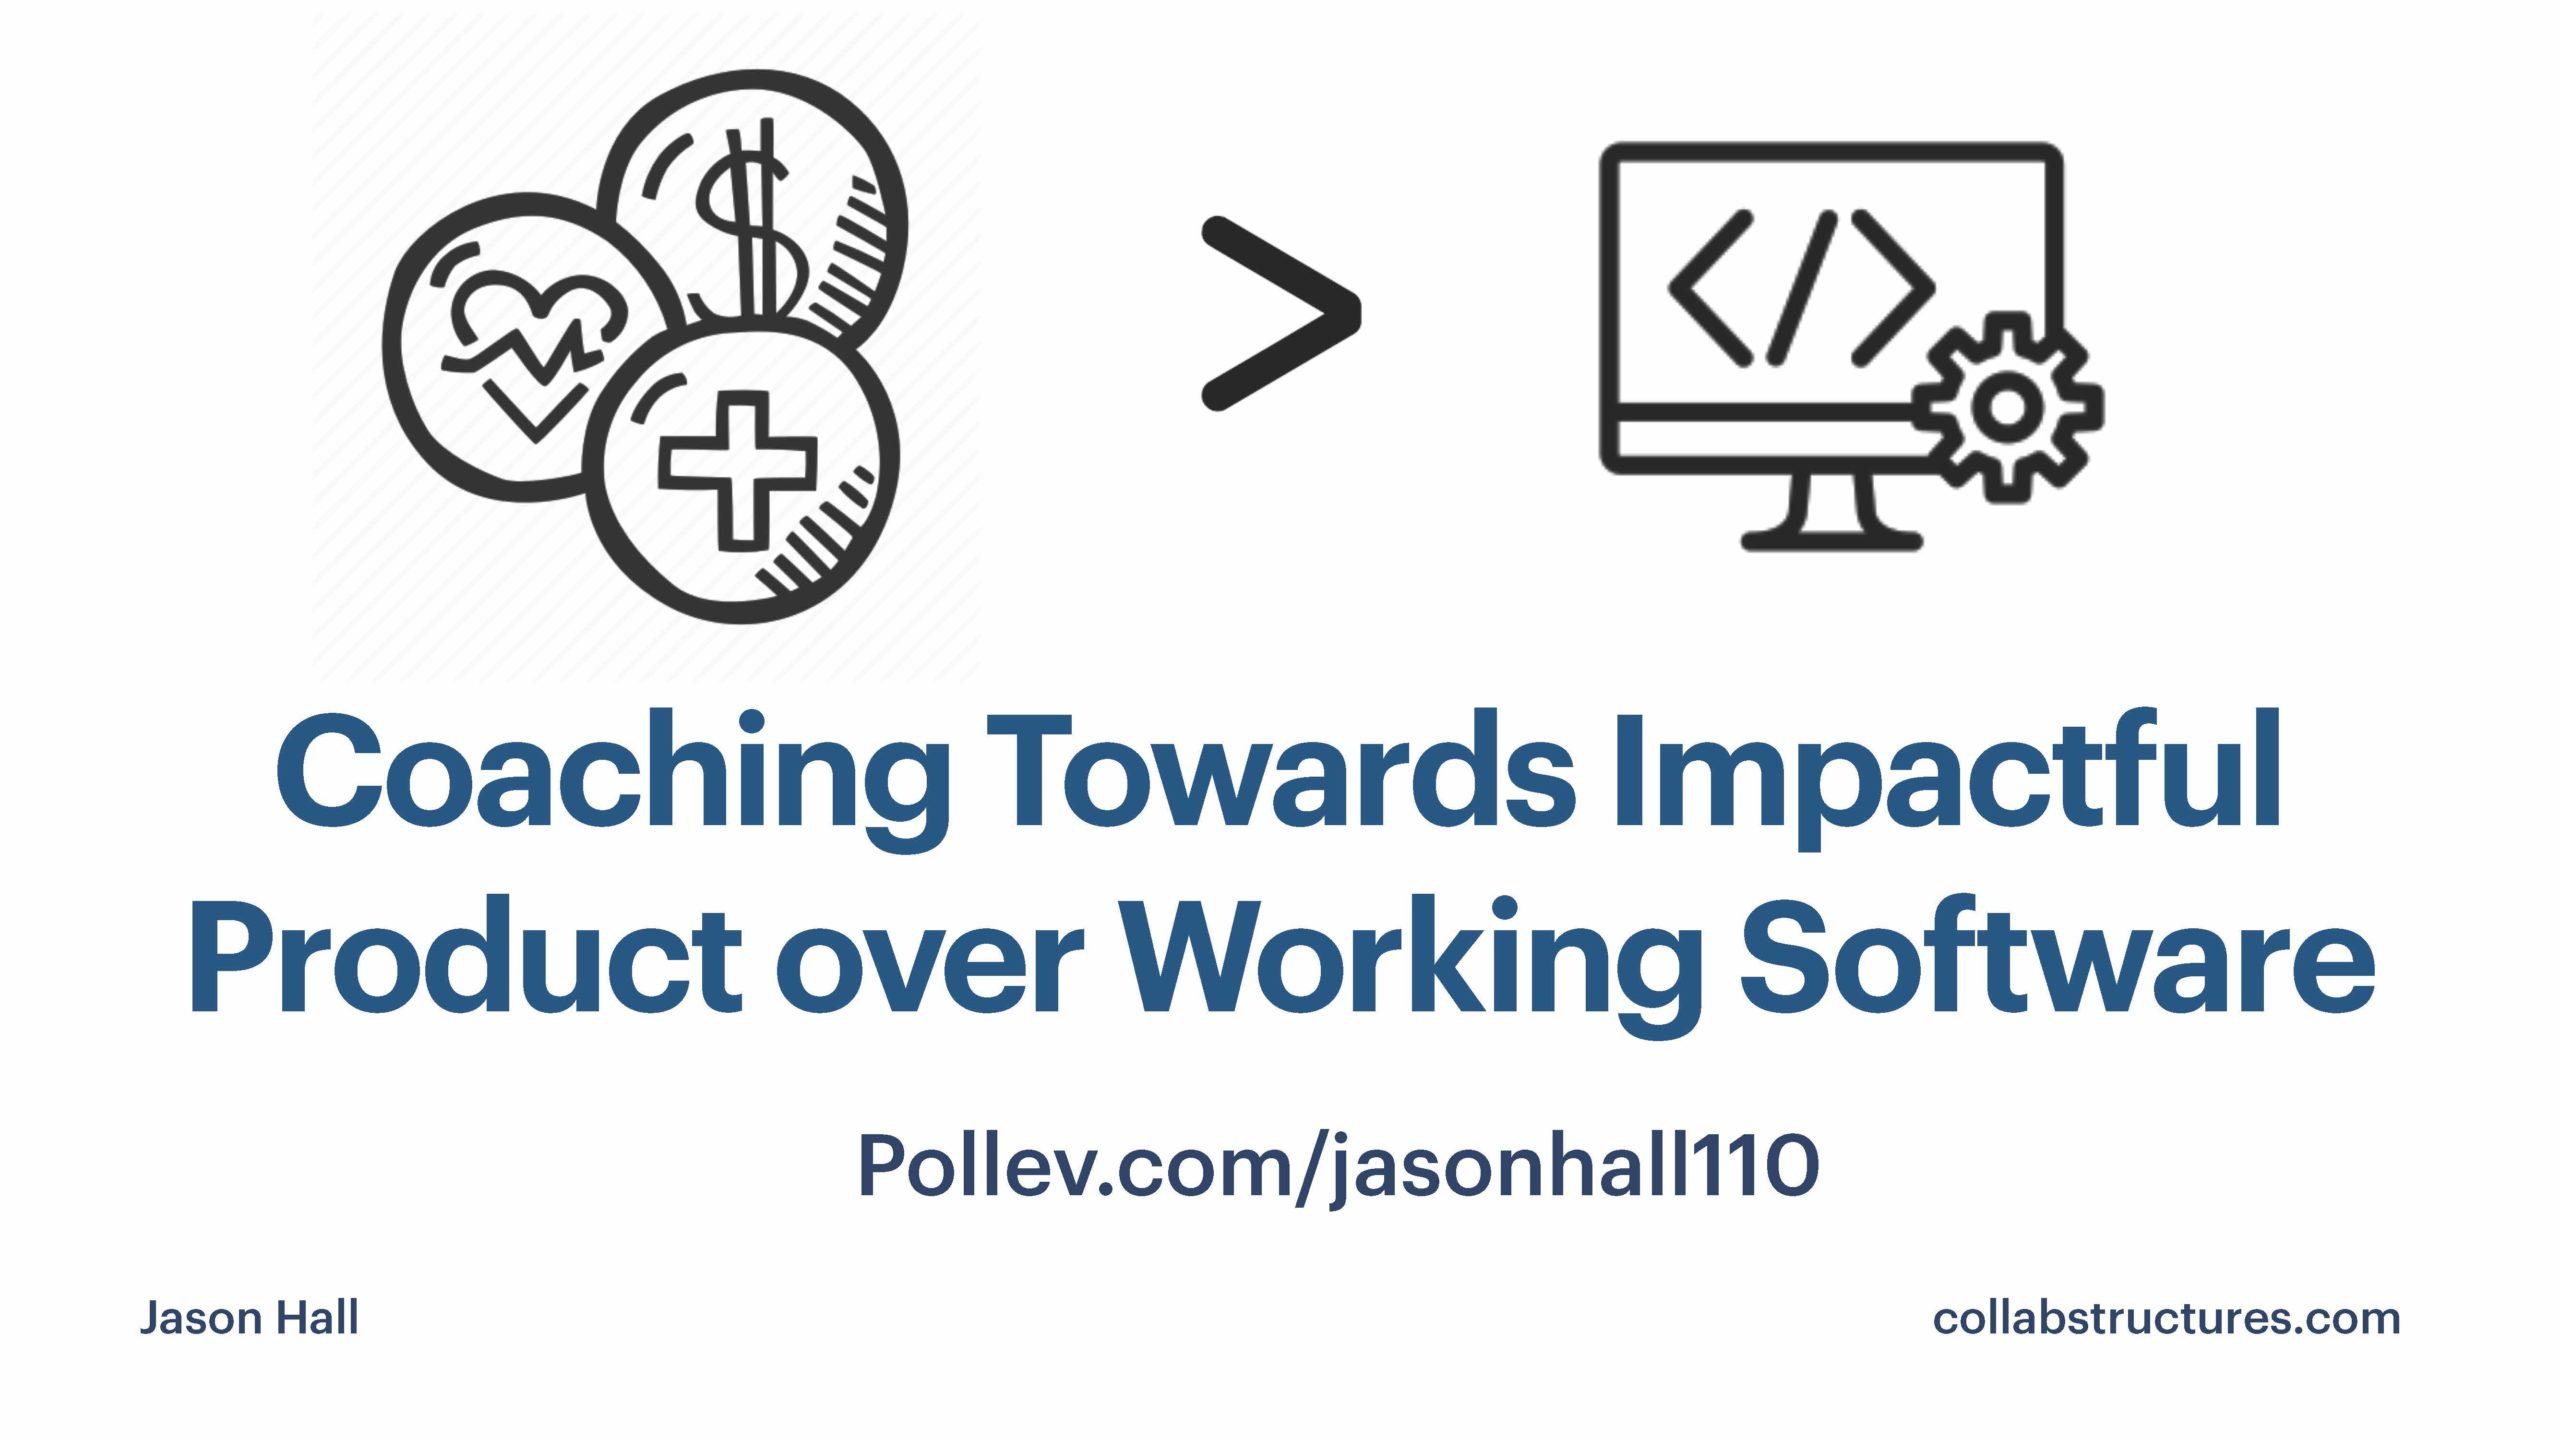 Coaching Towards Impactful Product with Jason Hall